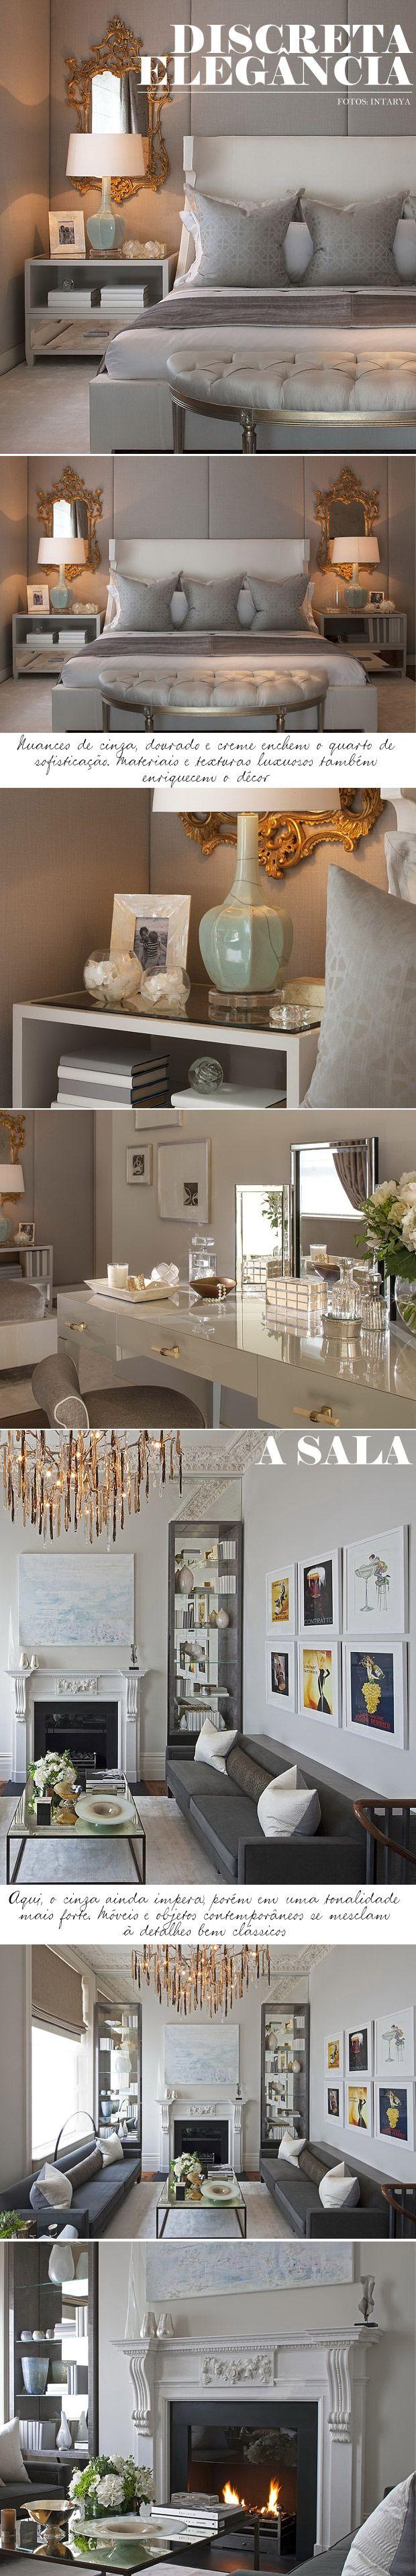 Love the modern take on the posters, White frames and modern from living-gazette-barbara-resende-comodos-quarto-sala-classico-contemporaneo-elegante-discreto